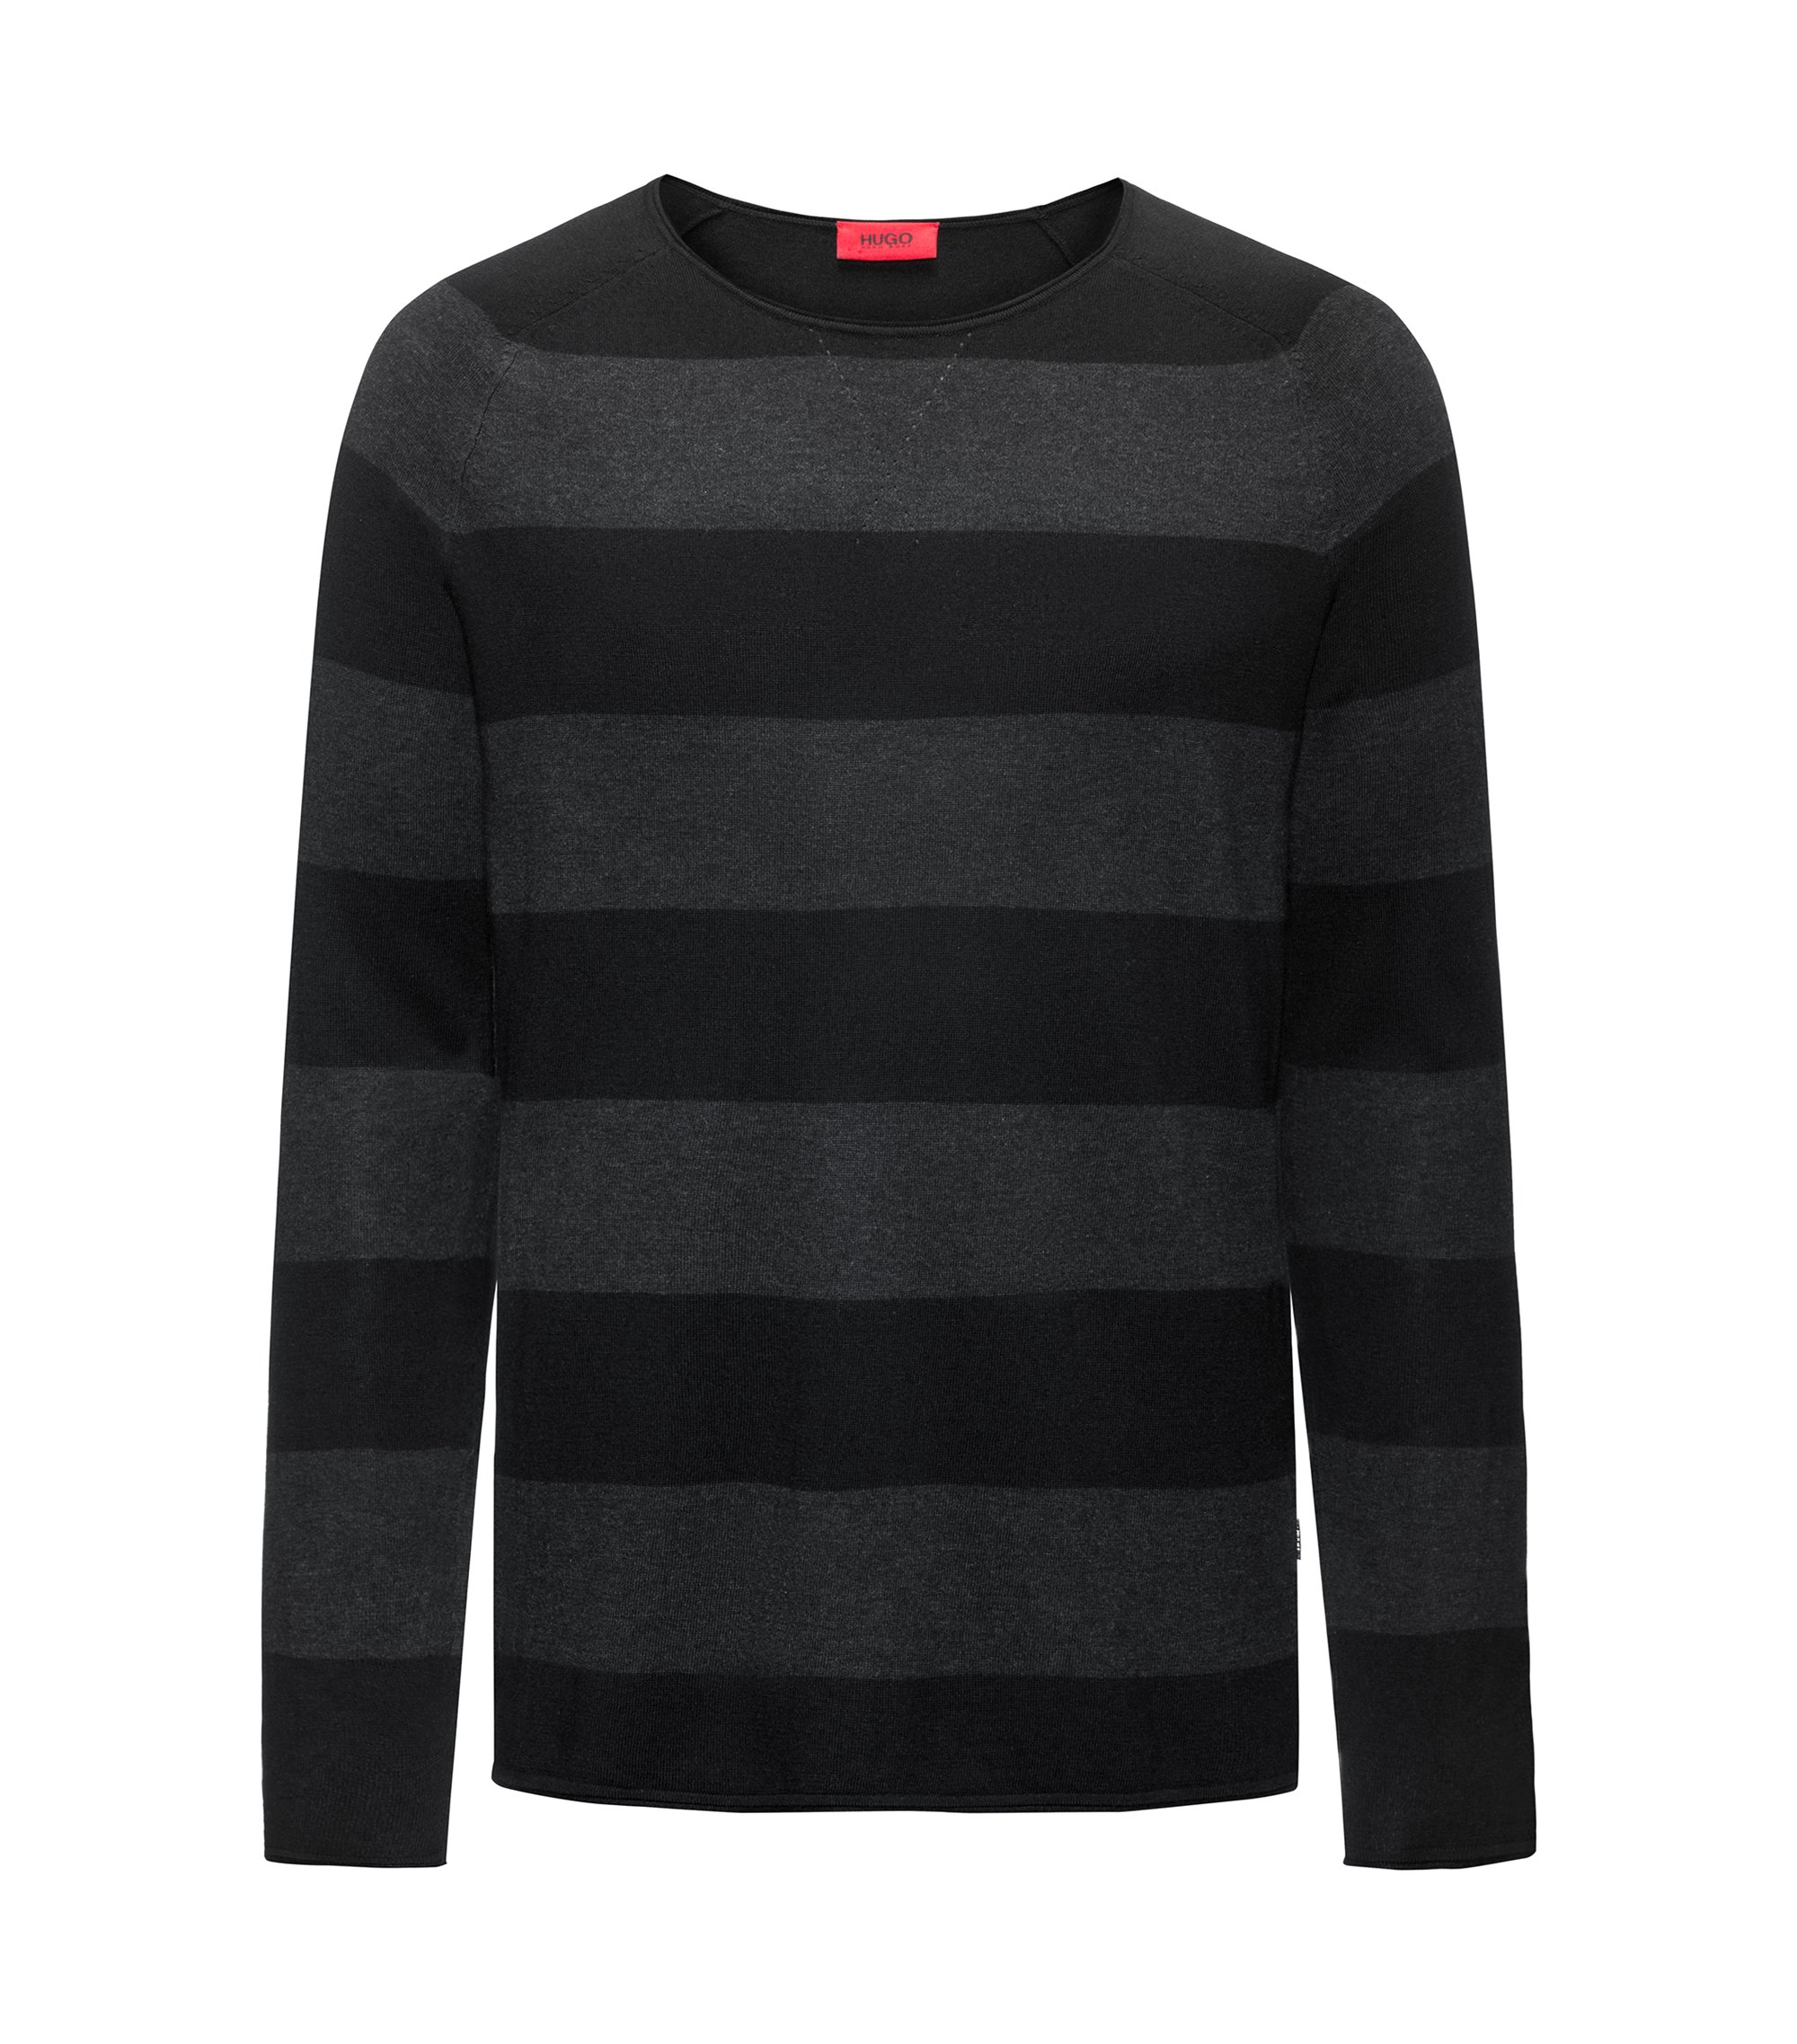 Block-stripe crew-neck sweater in a cotton blend, Black